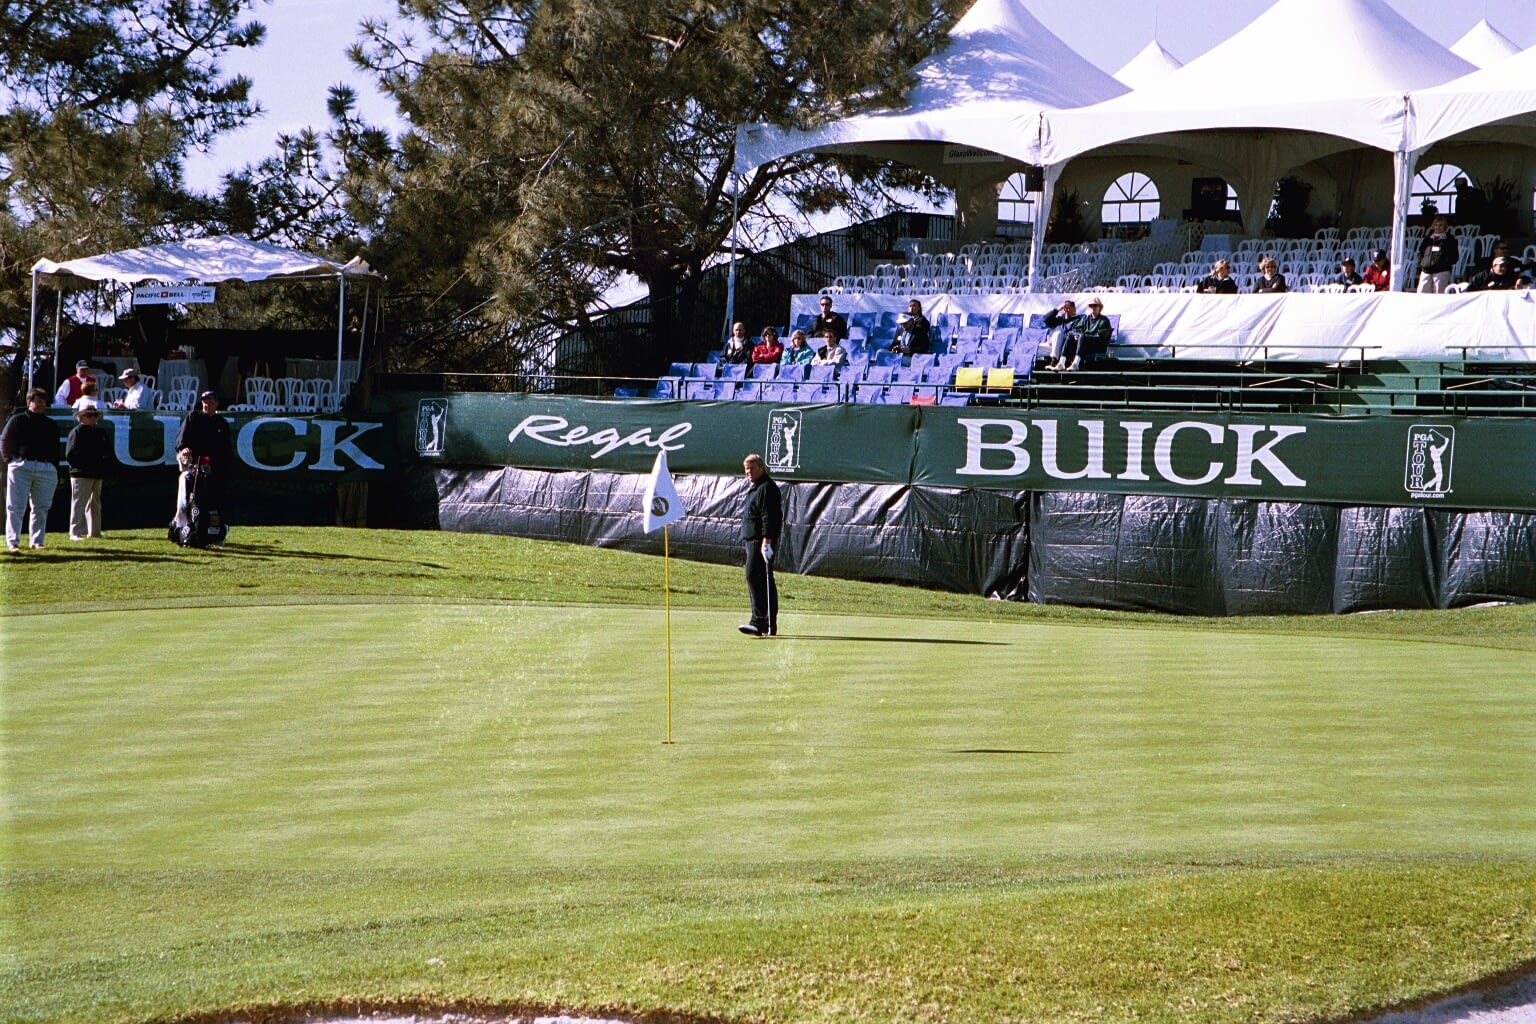 Buick 4th & Grape Image 1 (7)